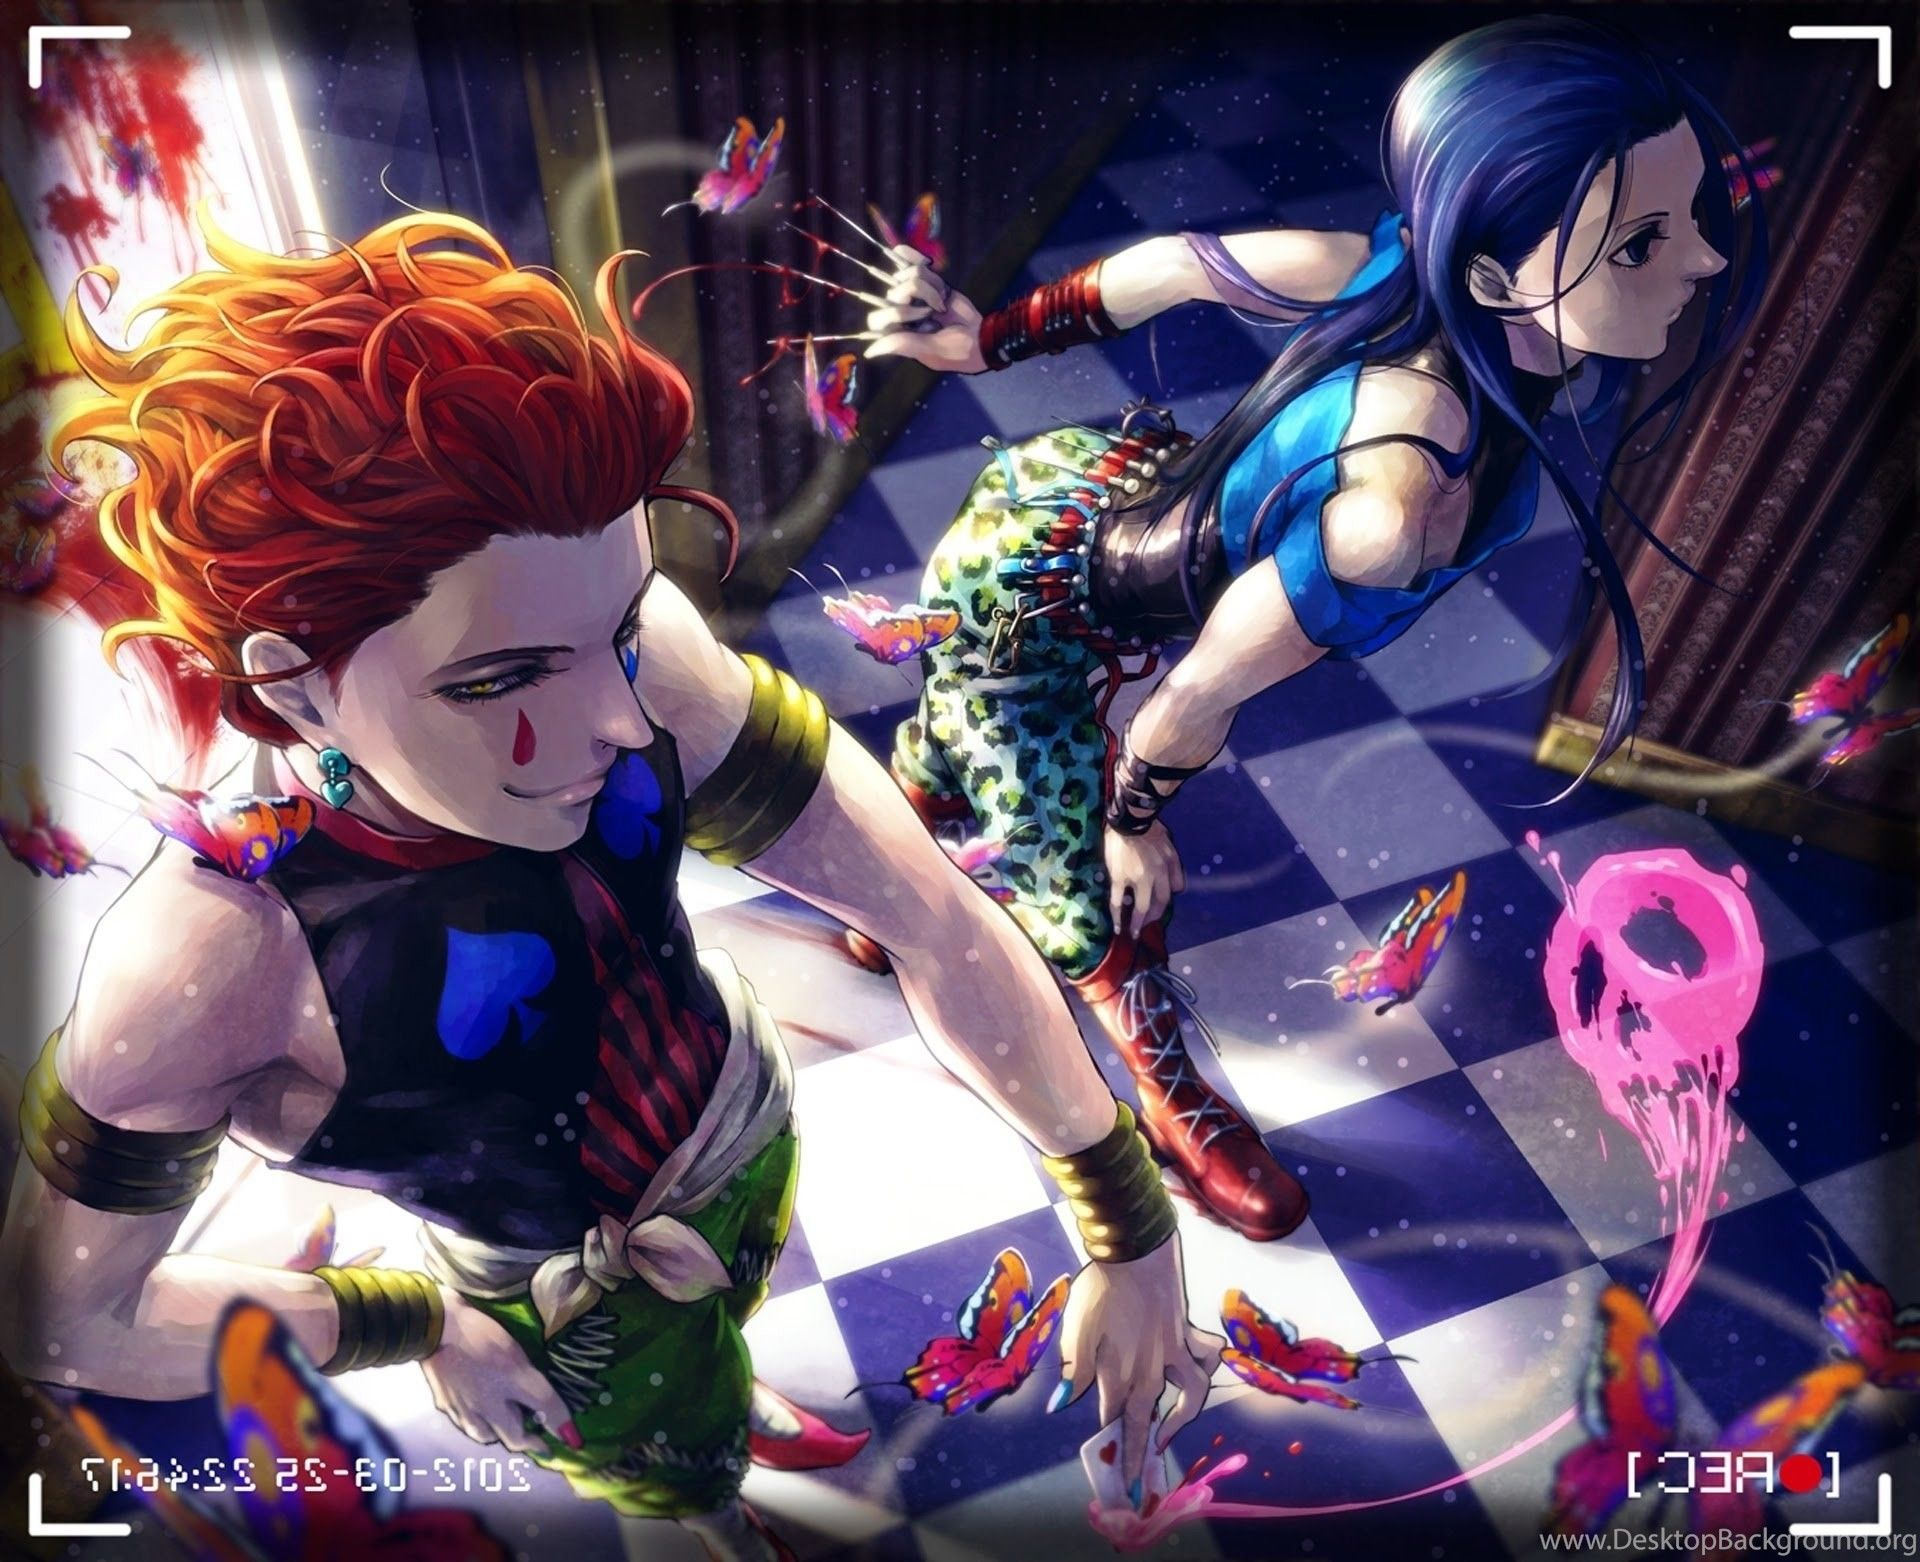 Anime Killua Ps4 Wallpapers - Wallpaper Cave